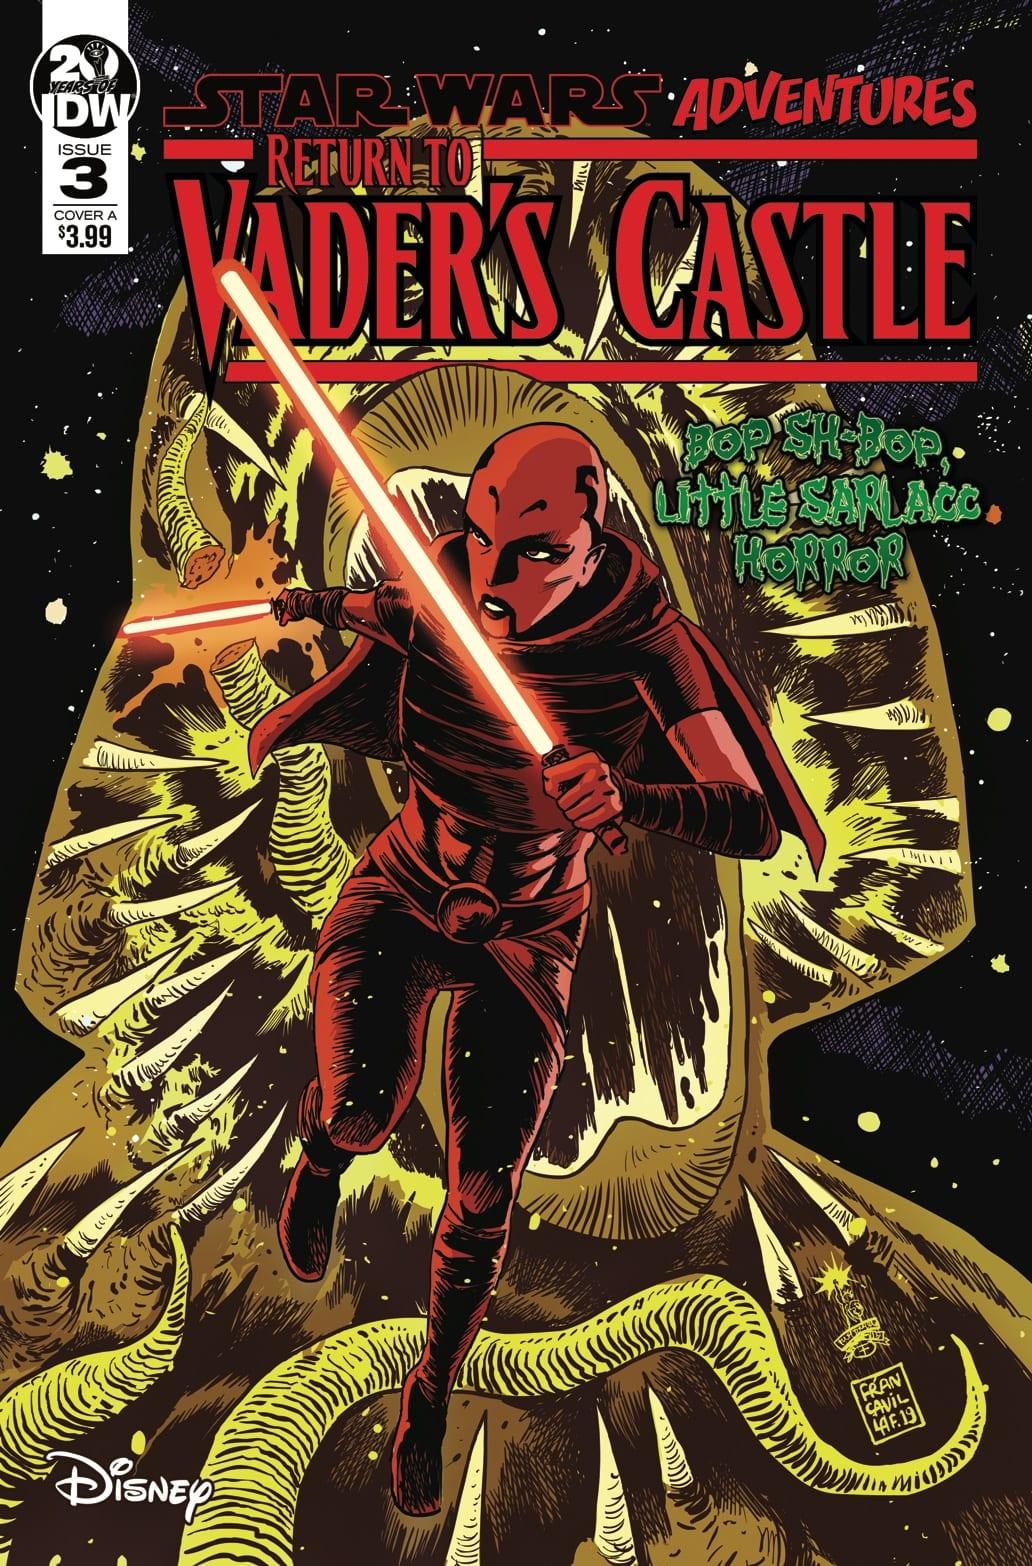 Review - STAR WARS ADVENTURES: RETURN TO VADER'S CASTLE #3 1